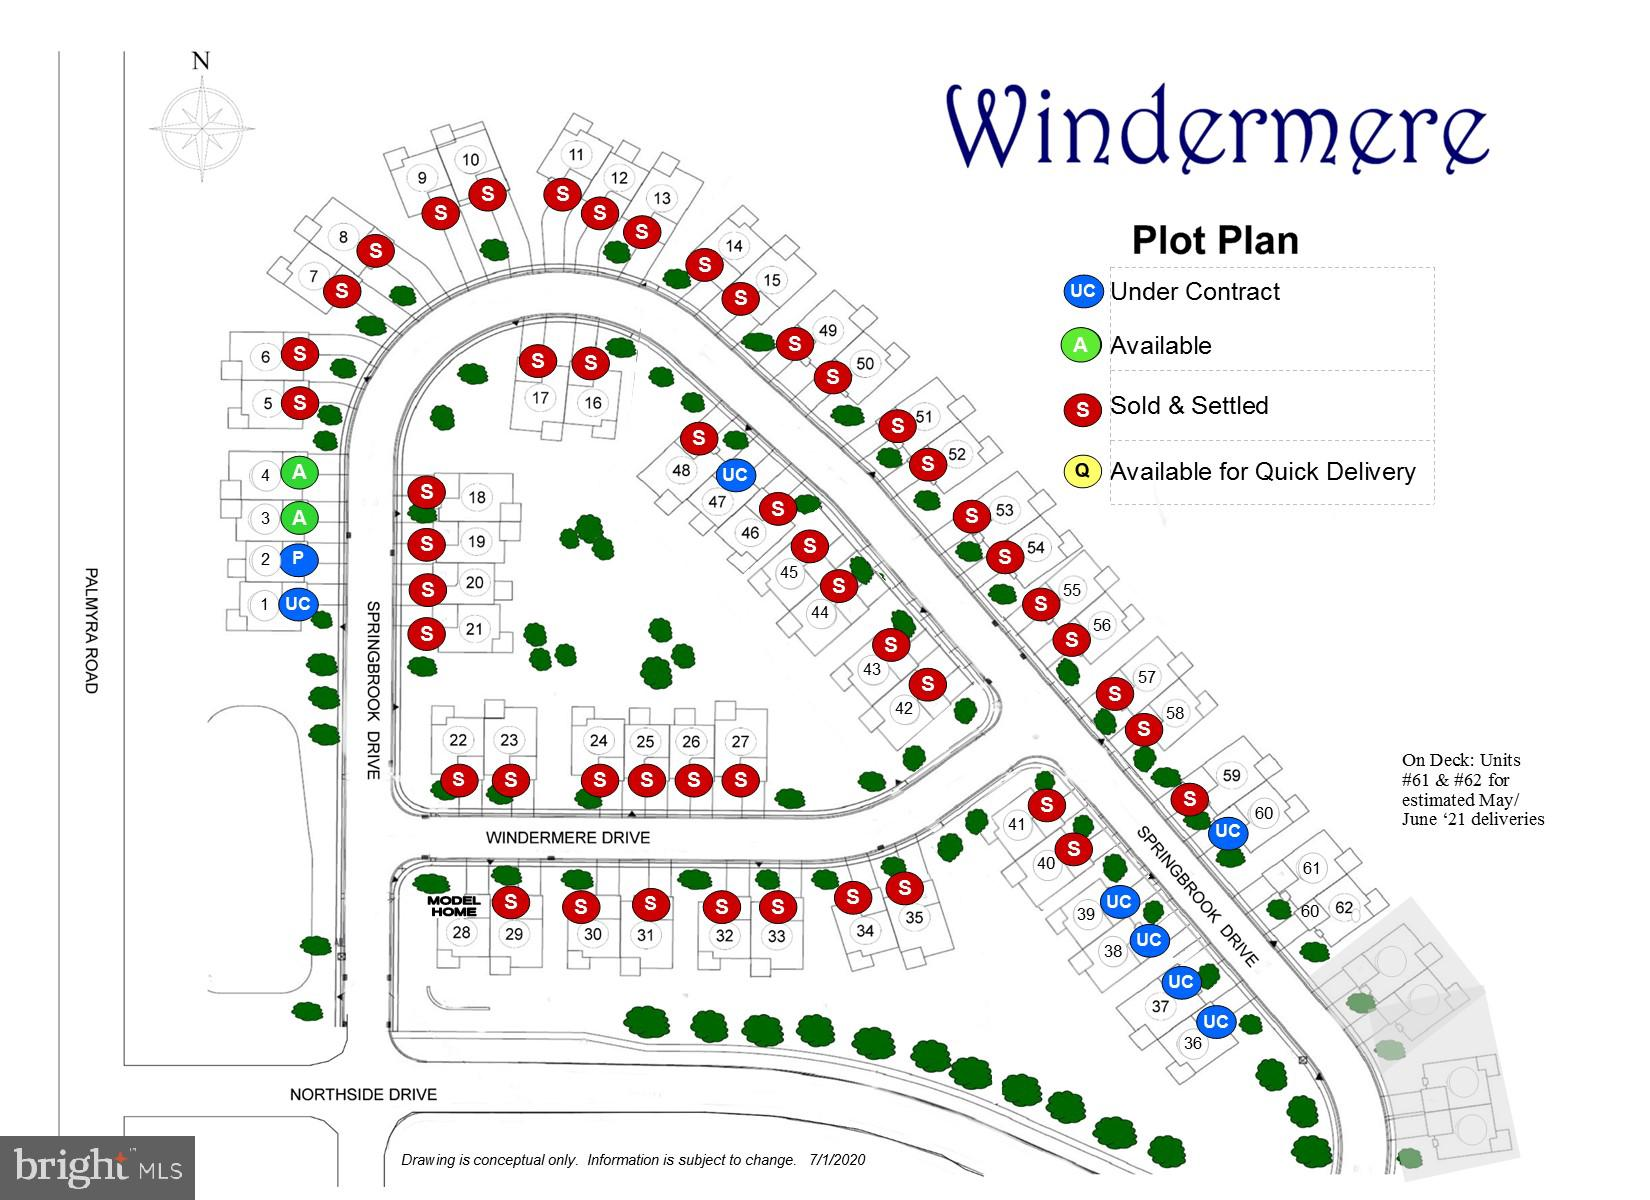 Windermere plot plan - subject to change